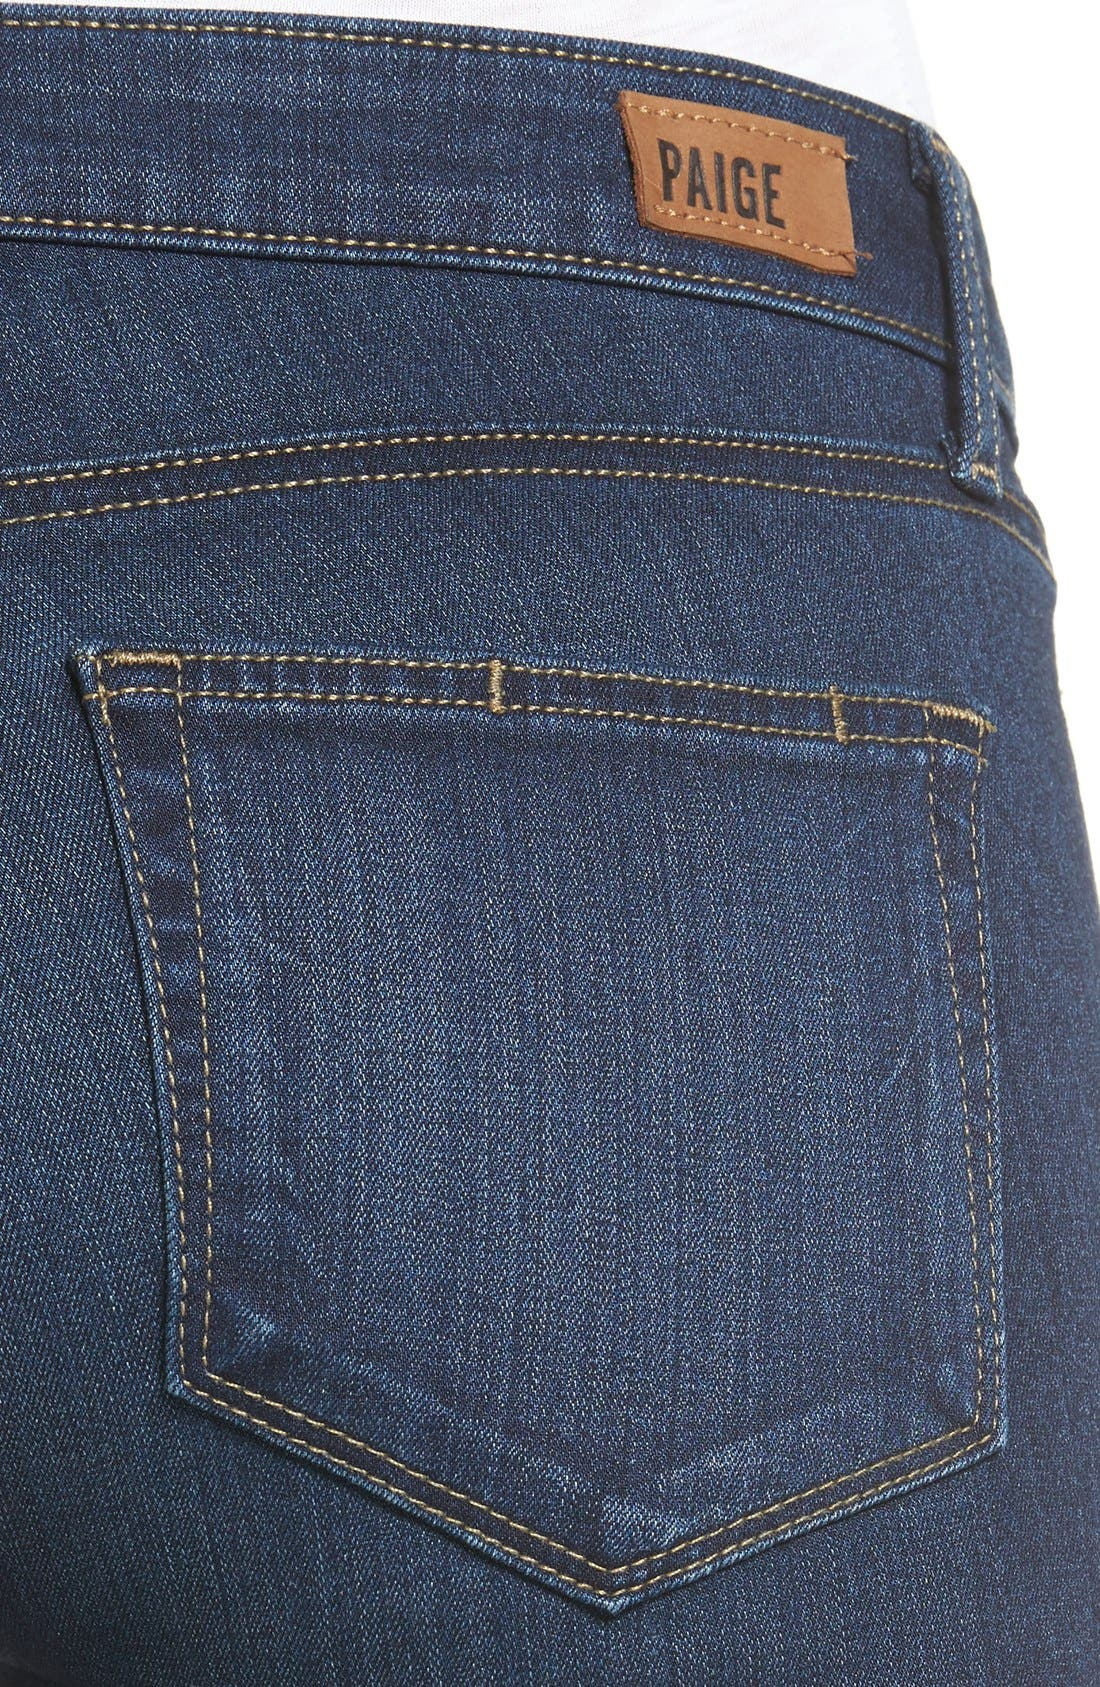 Transcend Skyline Skinny Jeans,                             Alternate thumbnail 6, color,                             400